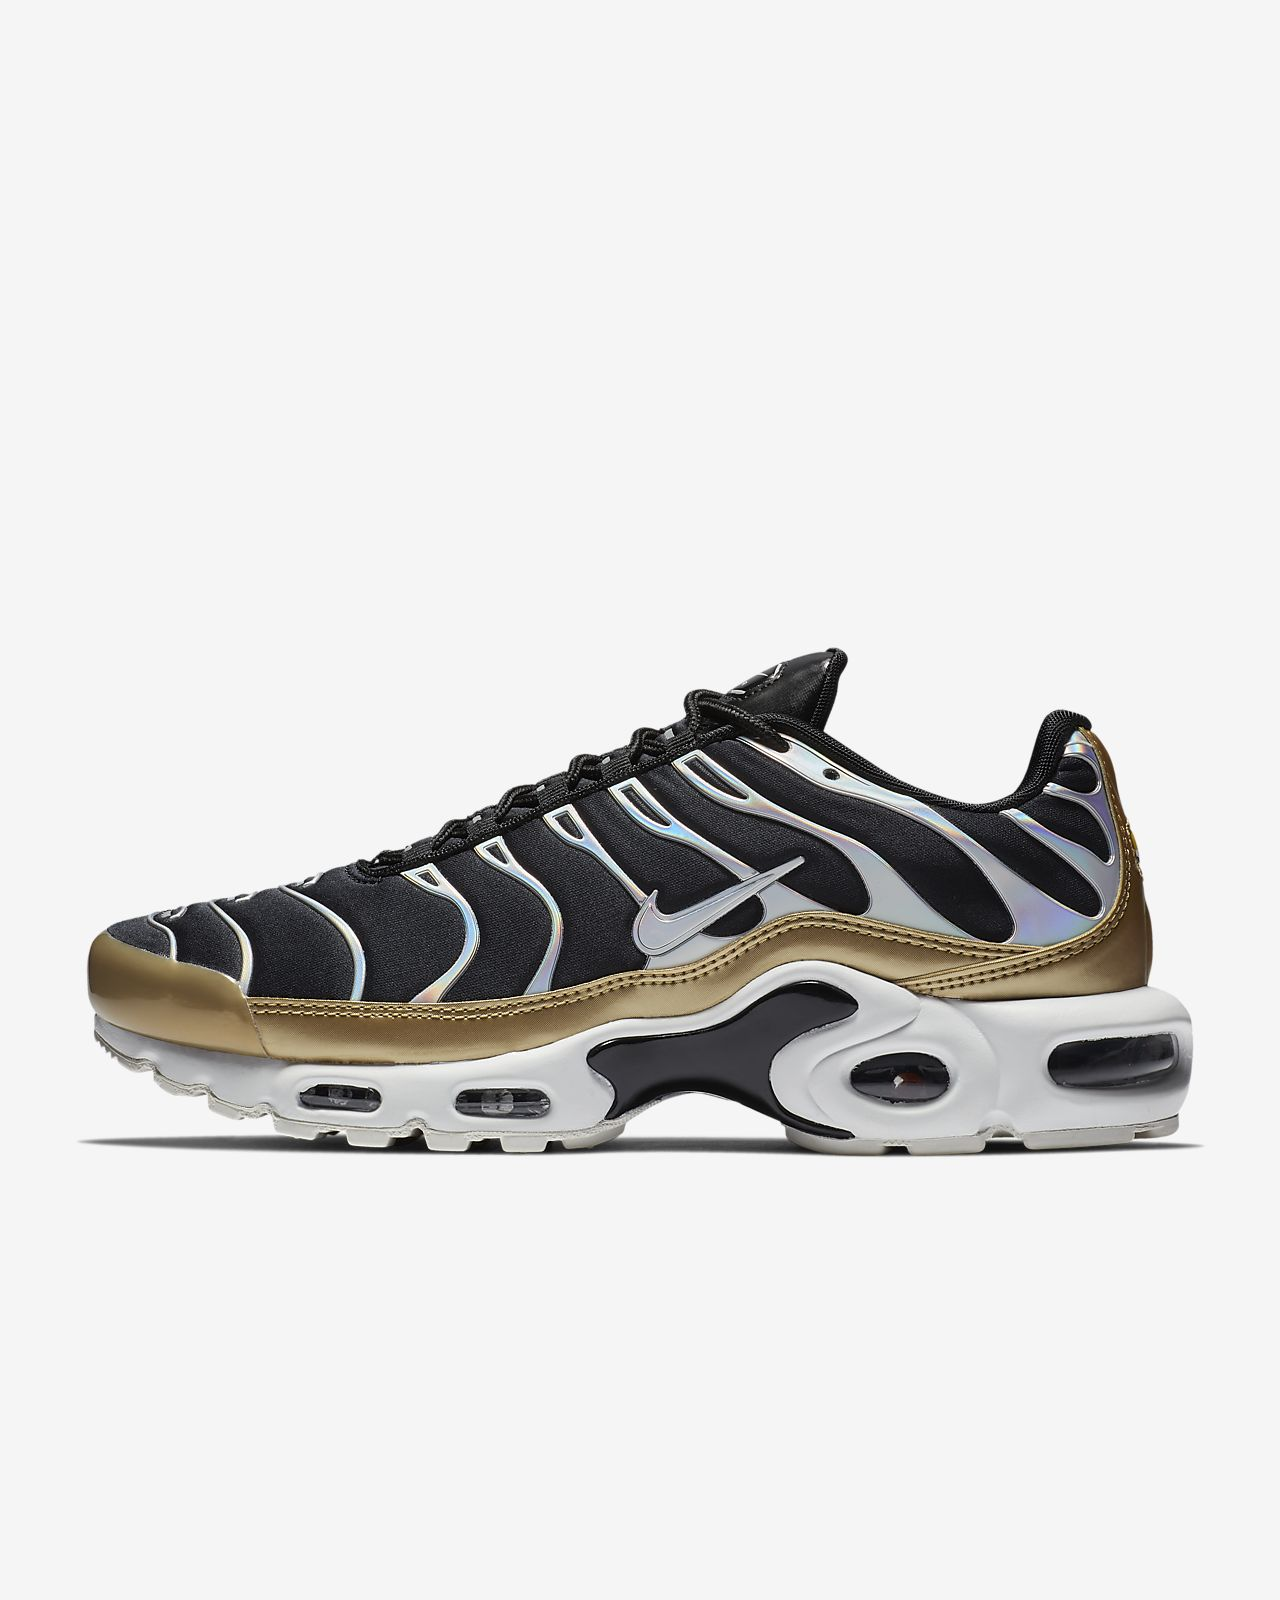 26ea2b109ea Nike Air Max Plus Metallic Women s Shoe. Nike.com EG